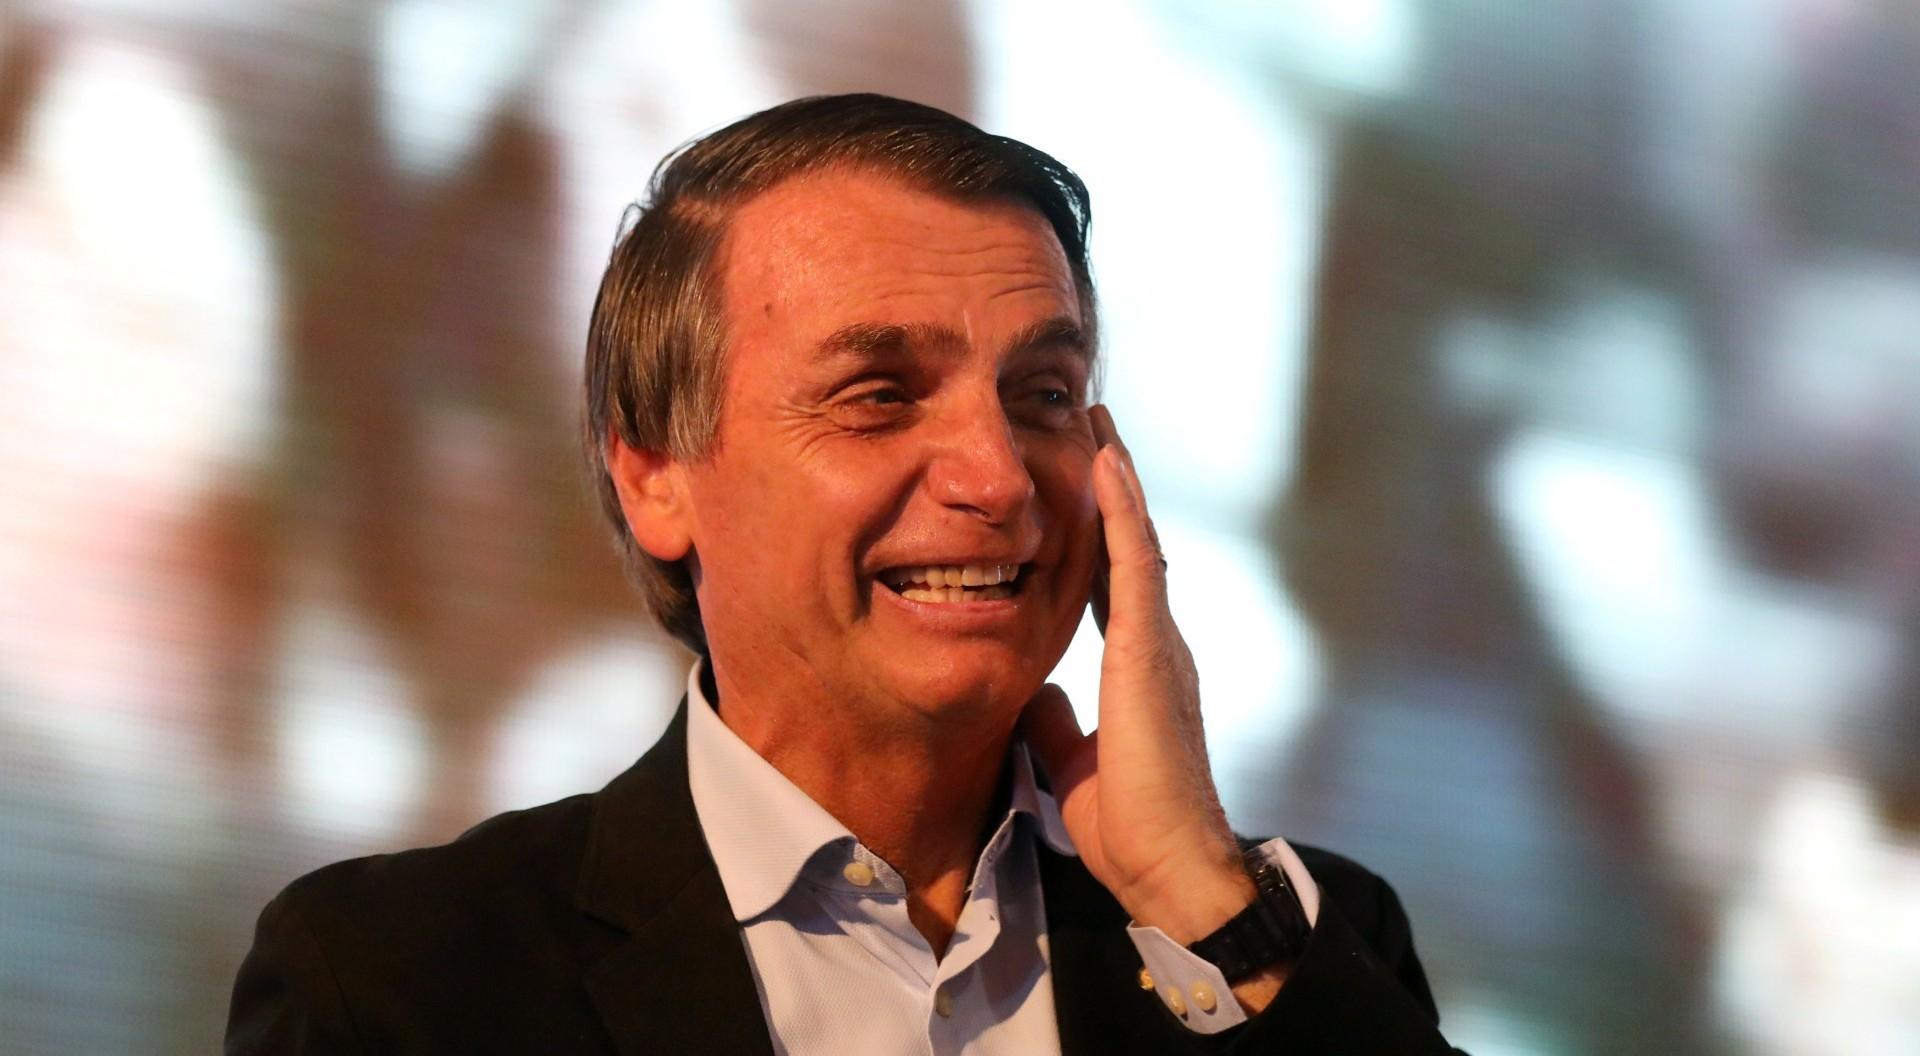 Jair Bolsonaro ultrapassa os 60% em nova pesquisa